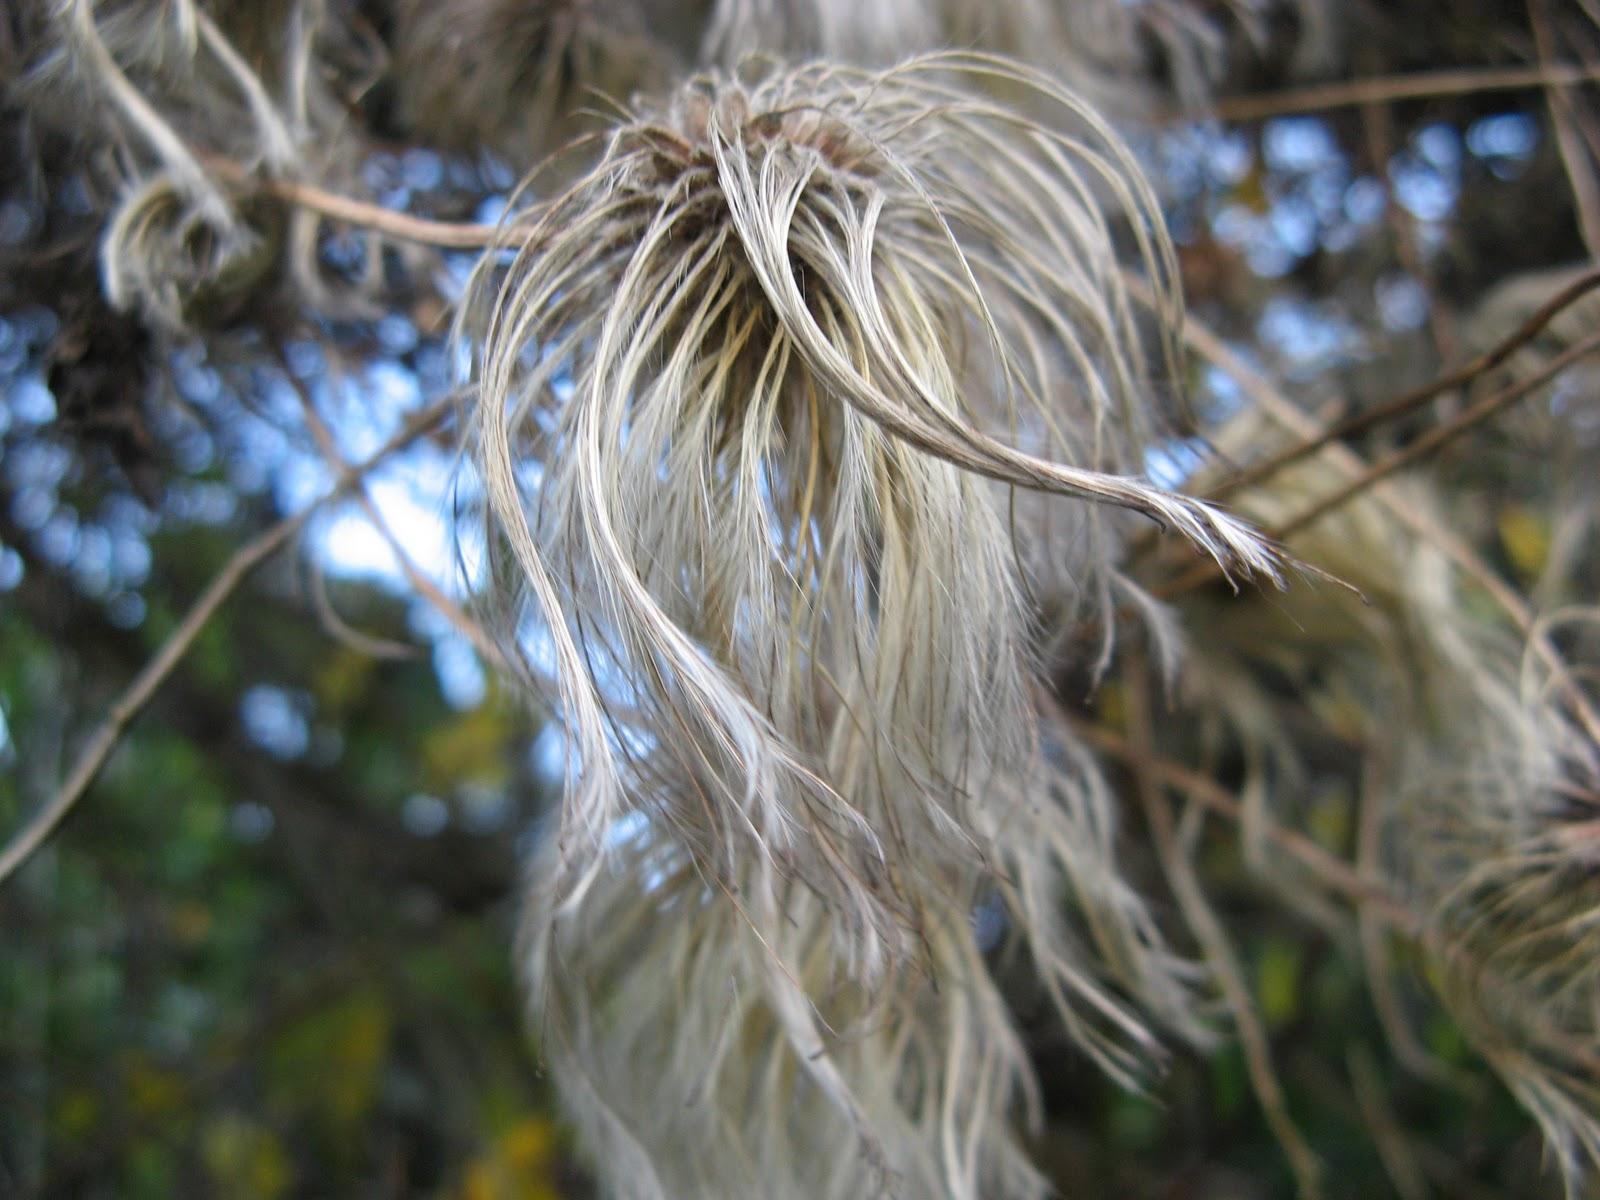 hairy Bush up close pic